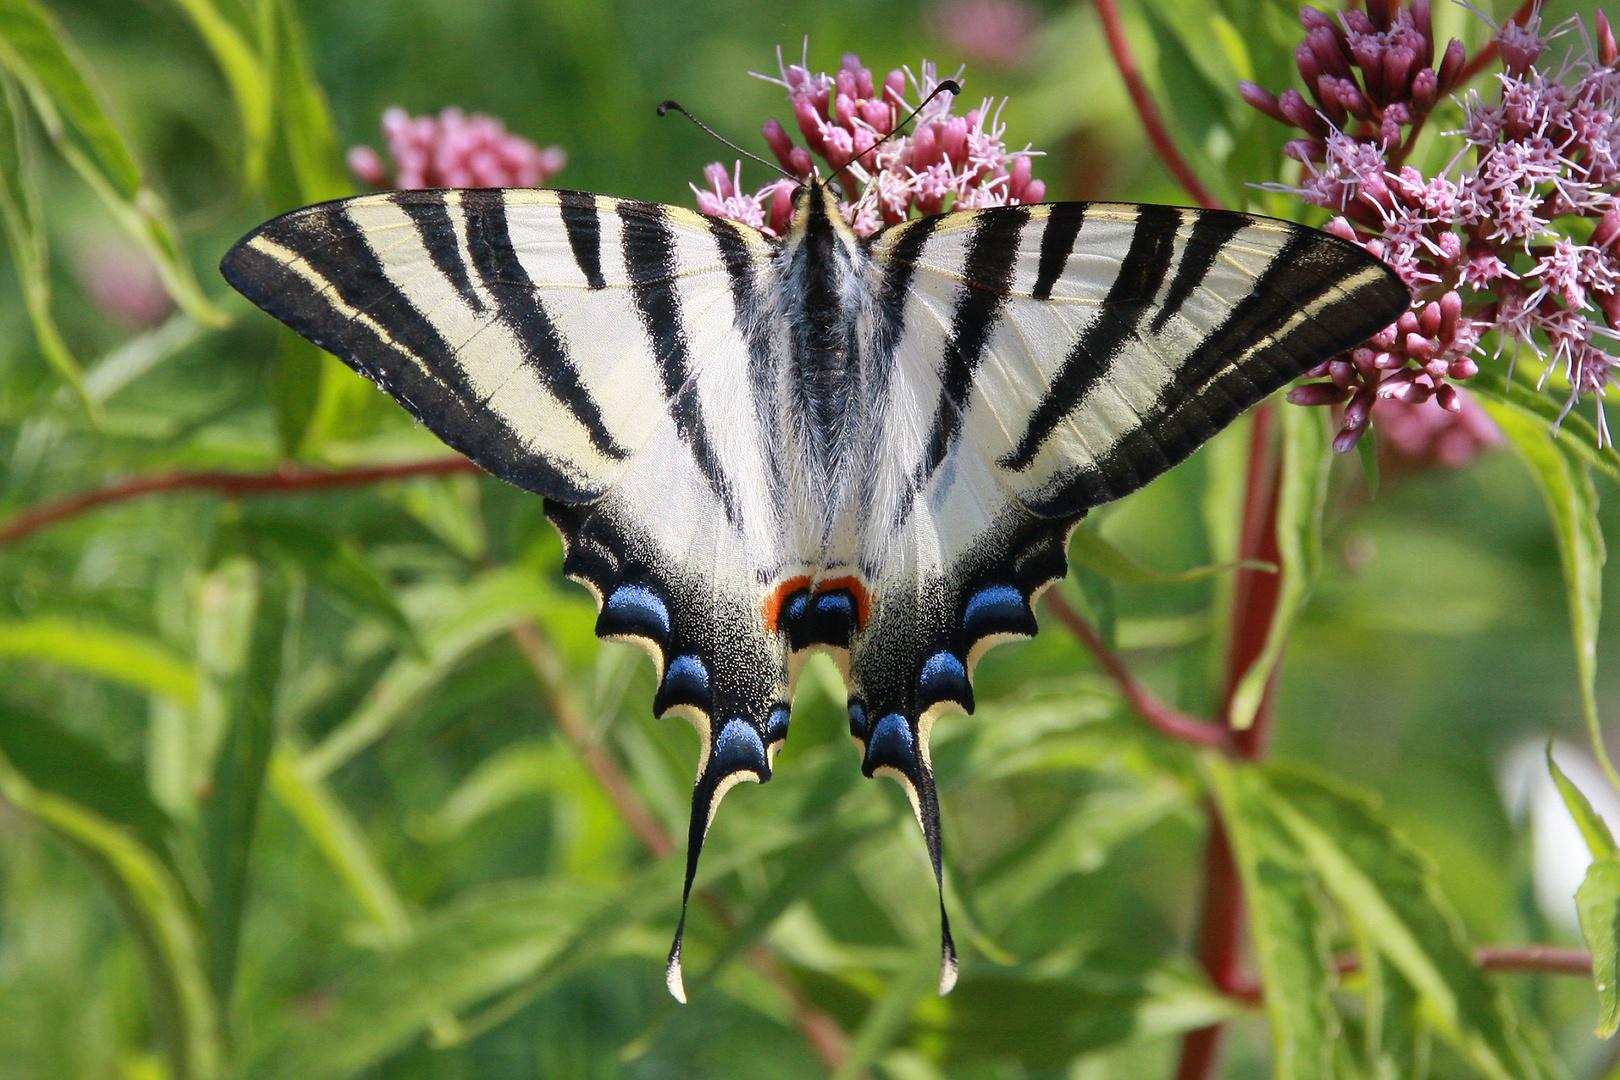 Segelfalter oder Scarce Swallowtail (Iphiclides podalirius)